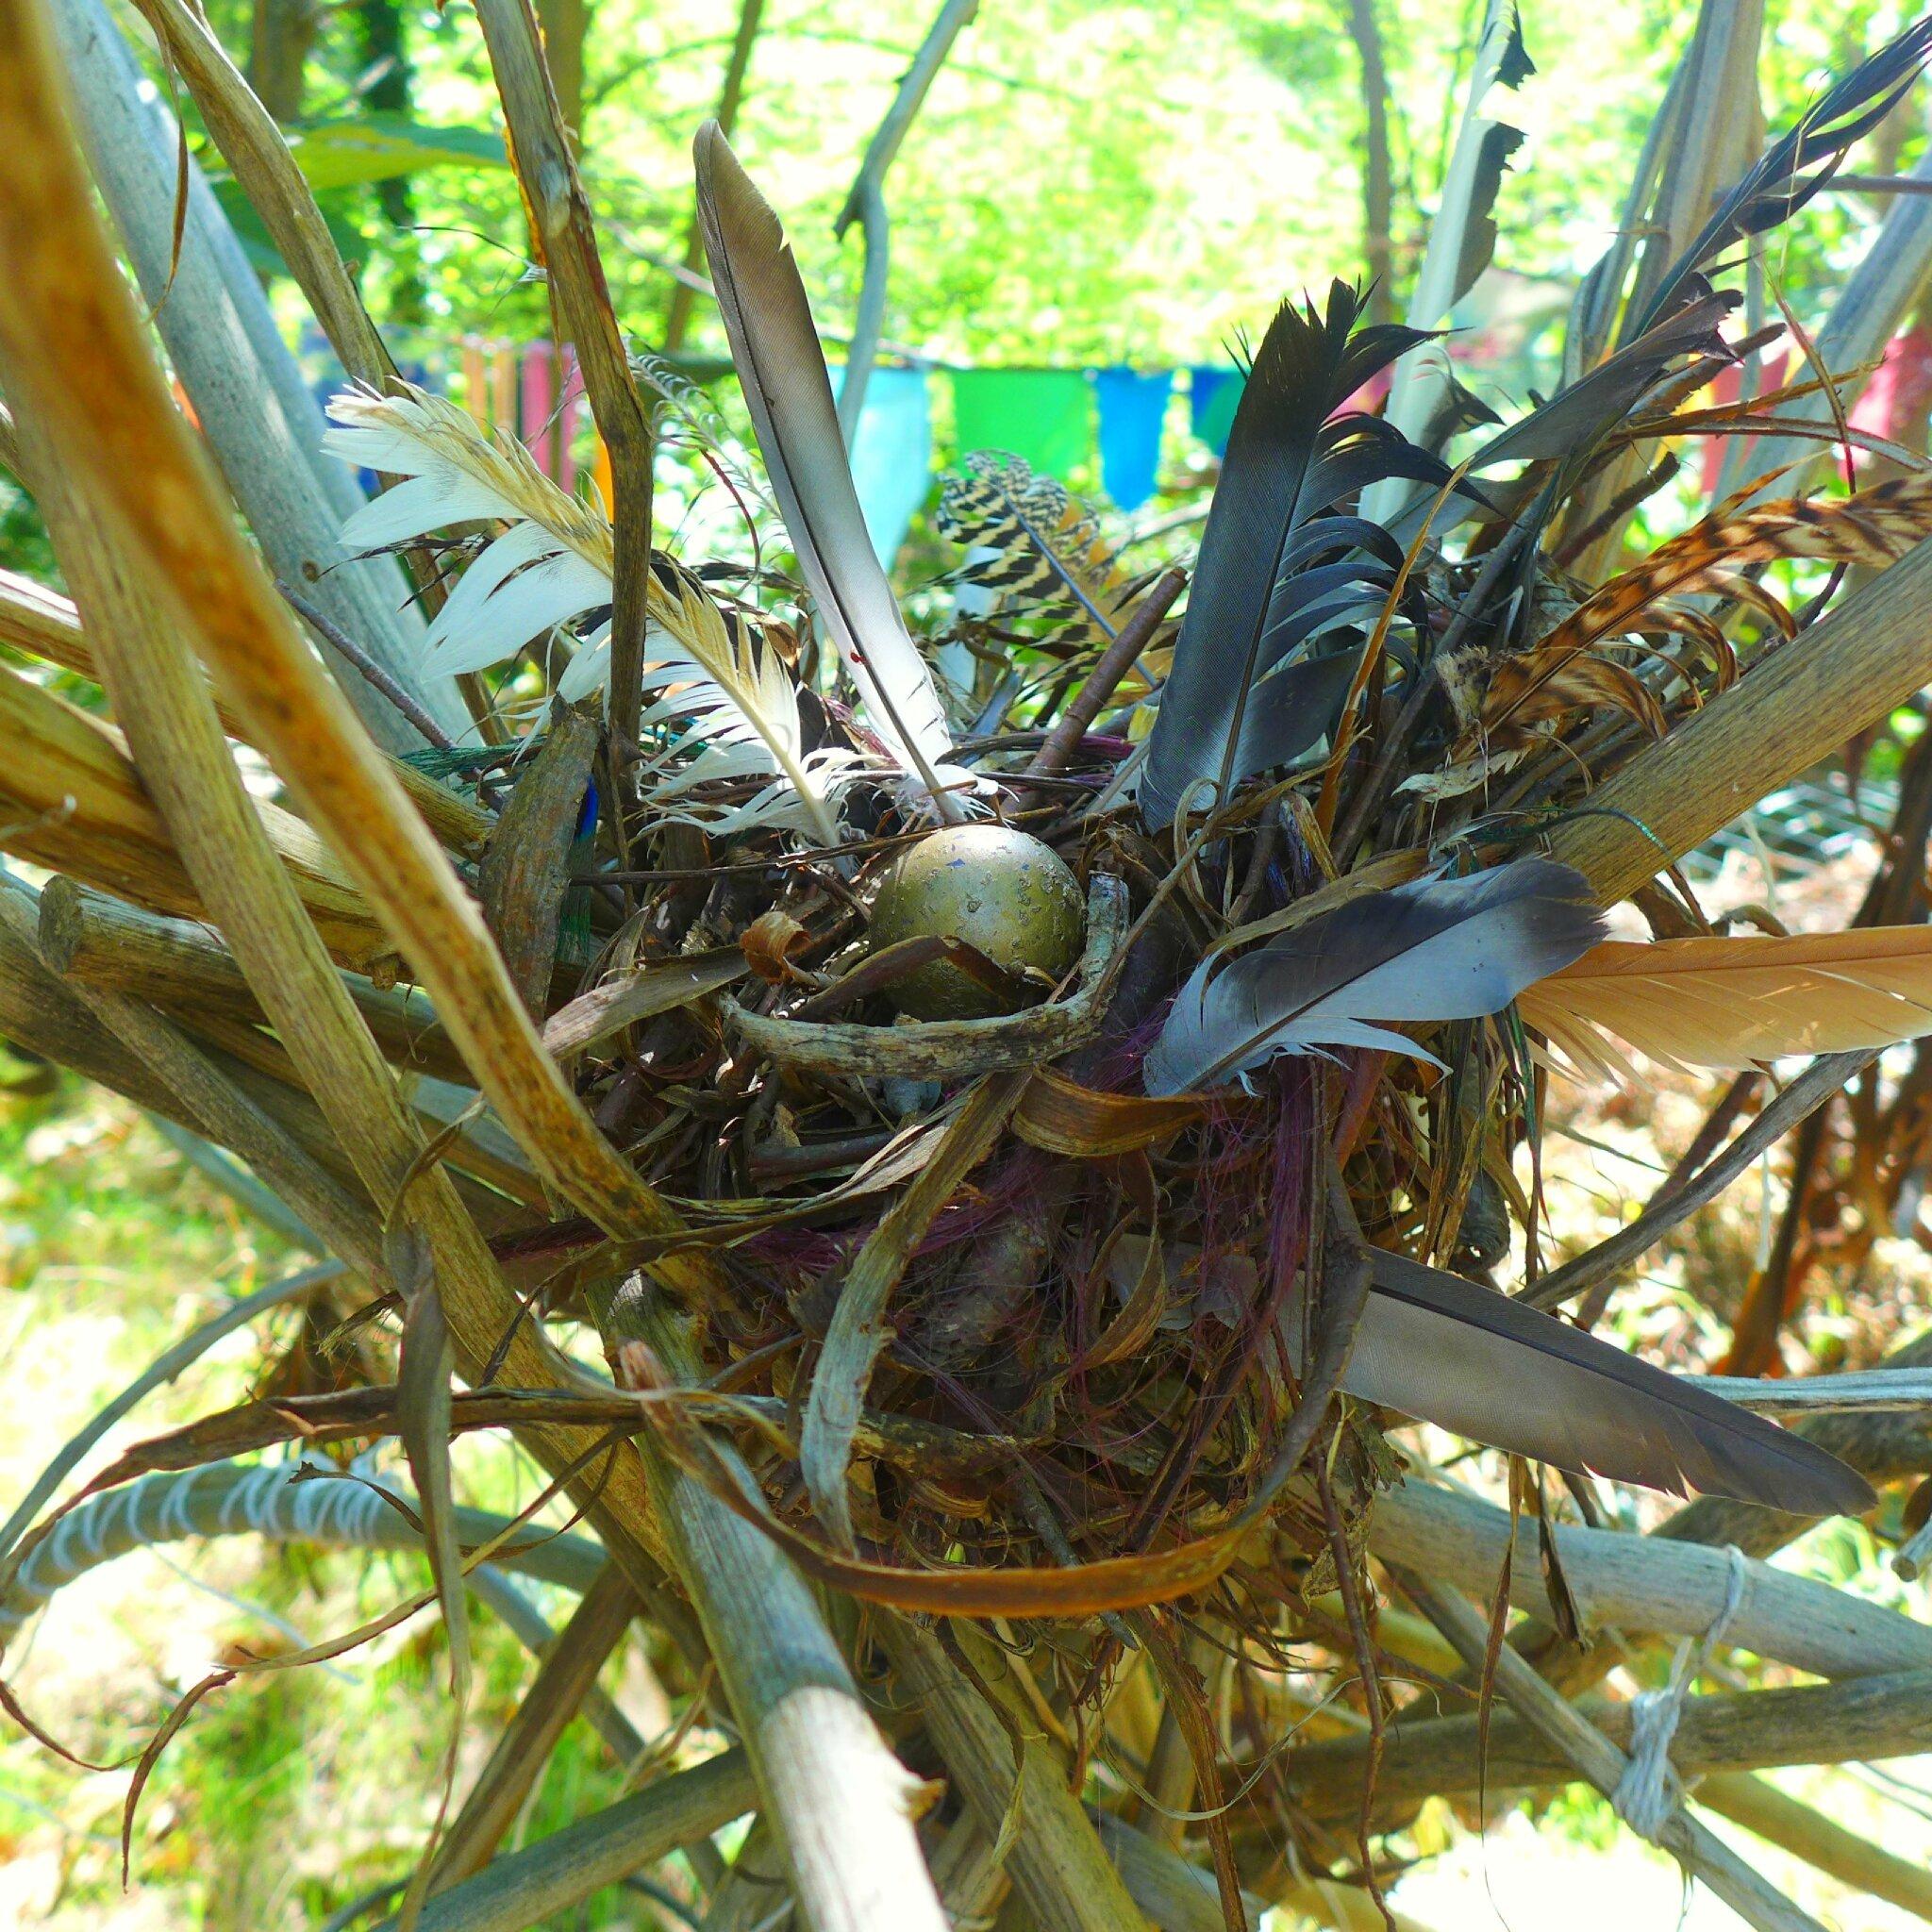 habitat d'un oiseau inconnu yurtao